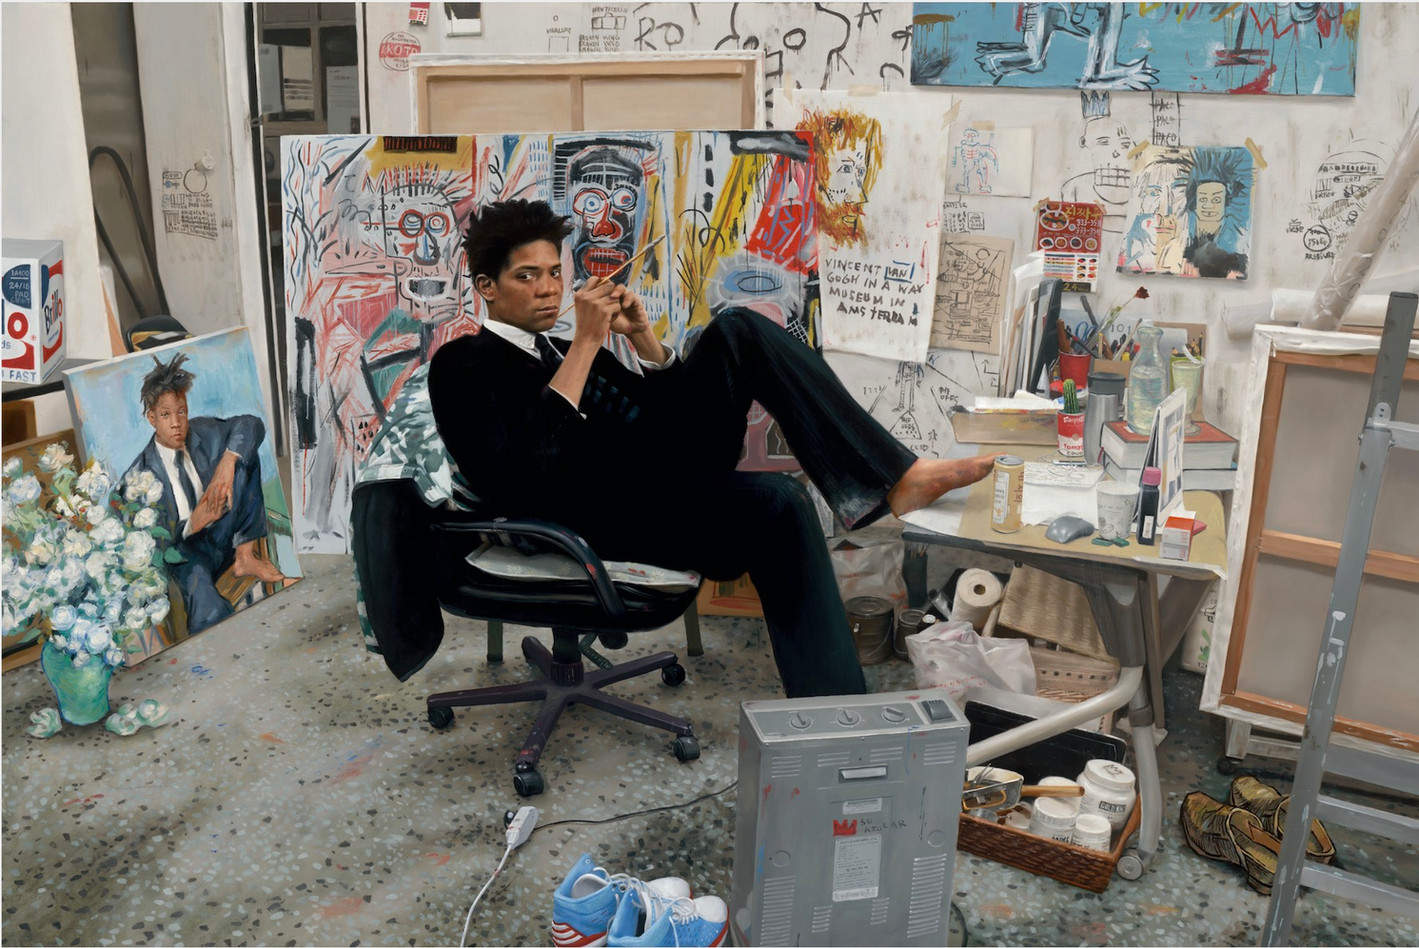 Kwon Neung Basquiat, 2019 Oil on canvas 72 x 108 cm